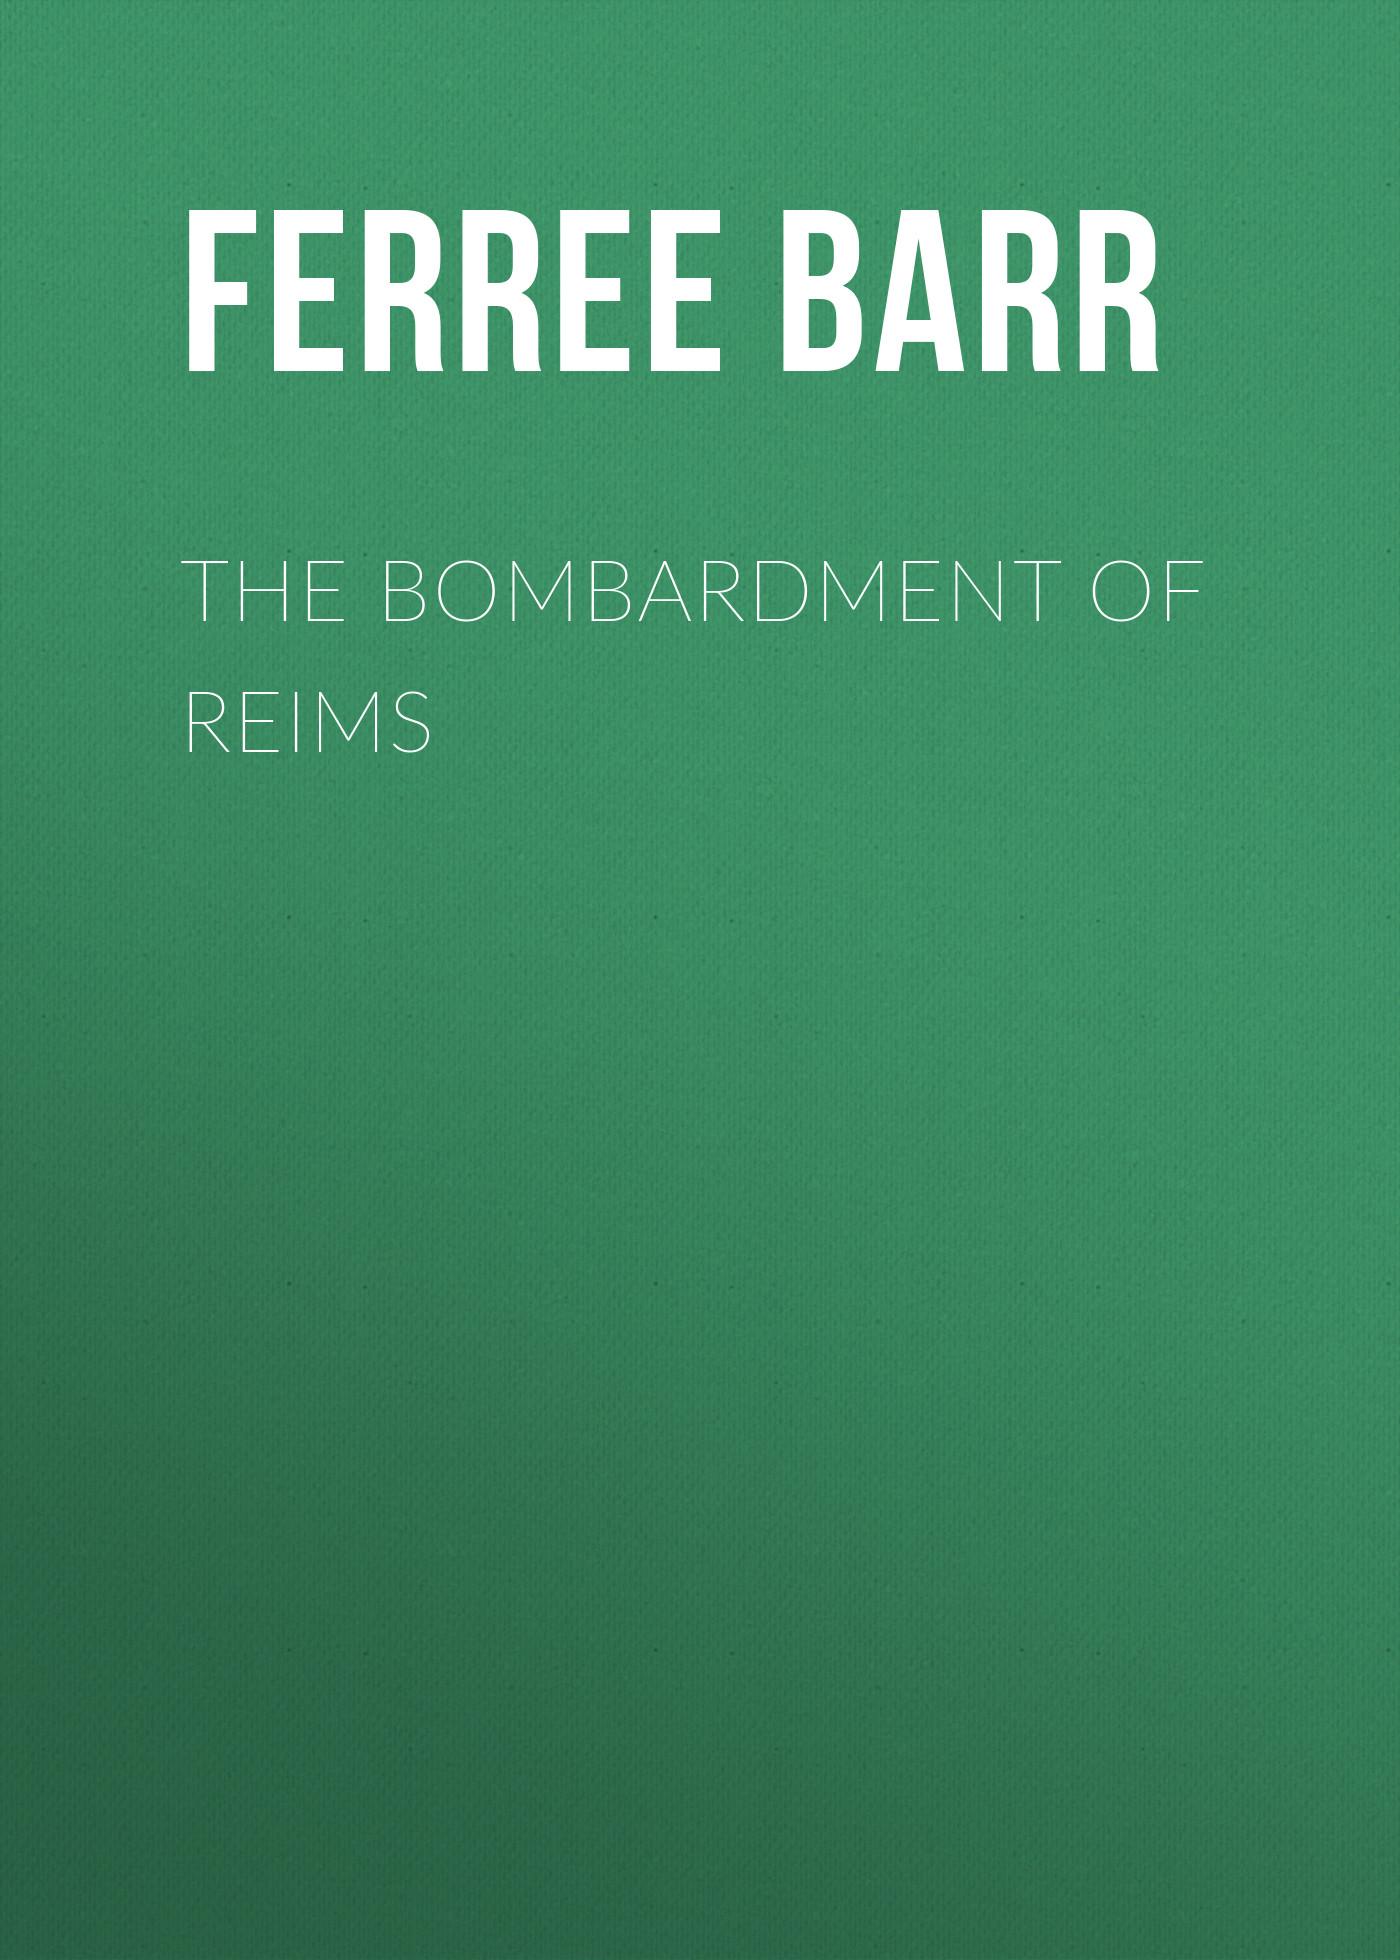 все цены на Ferree Barr The Bombardment of Reims